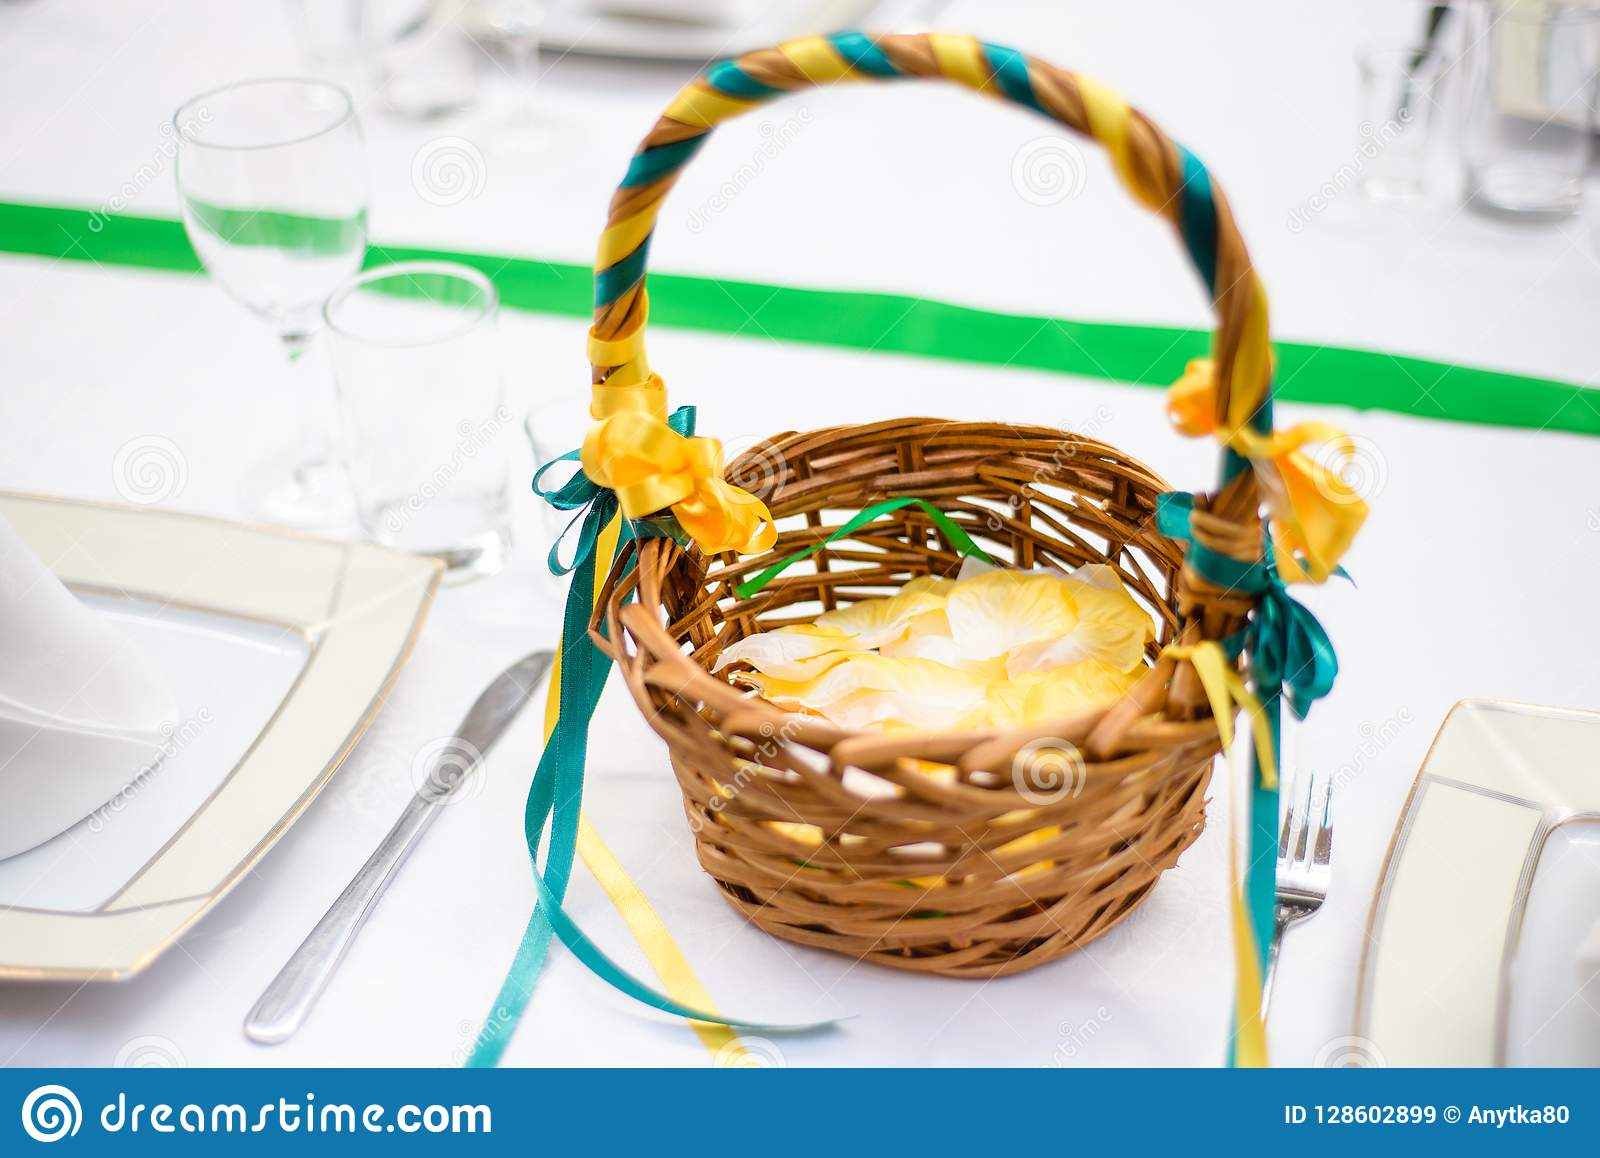 Basket With Petals Decor For A Wedding Stock Image Image Of Elegant Food 128602899